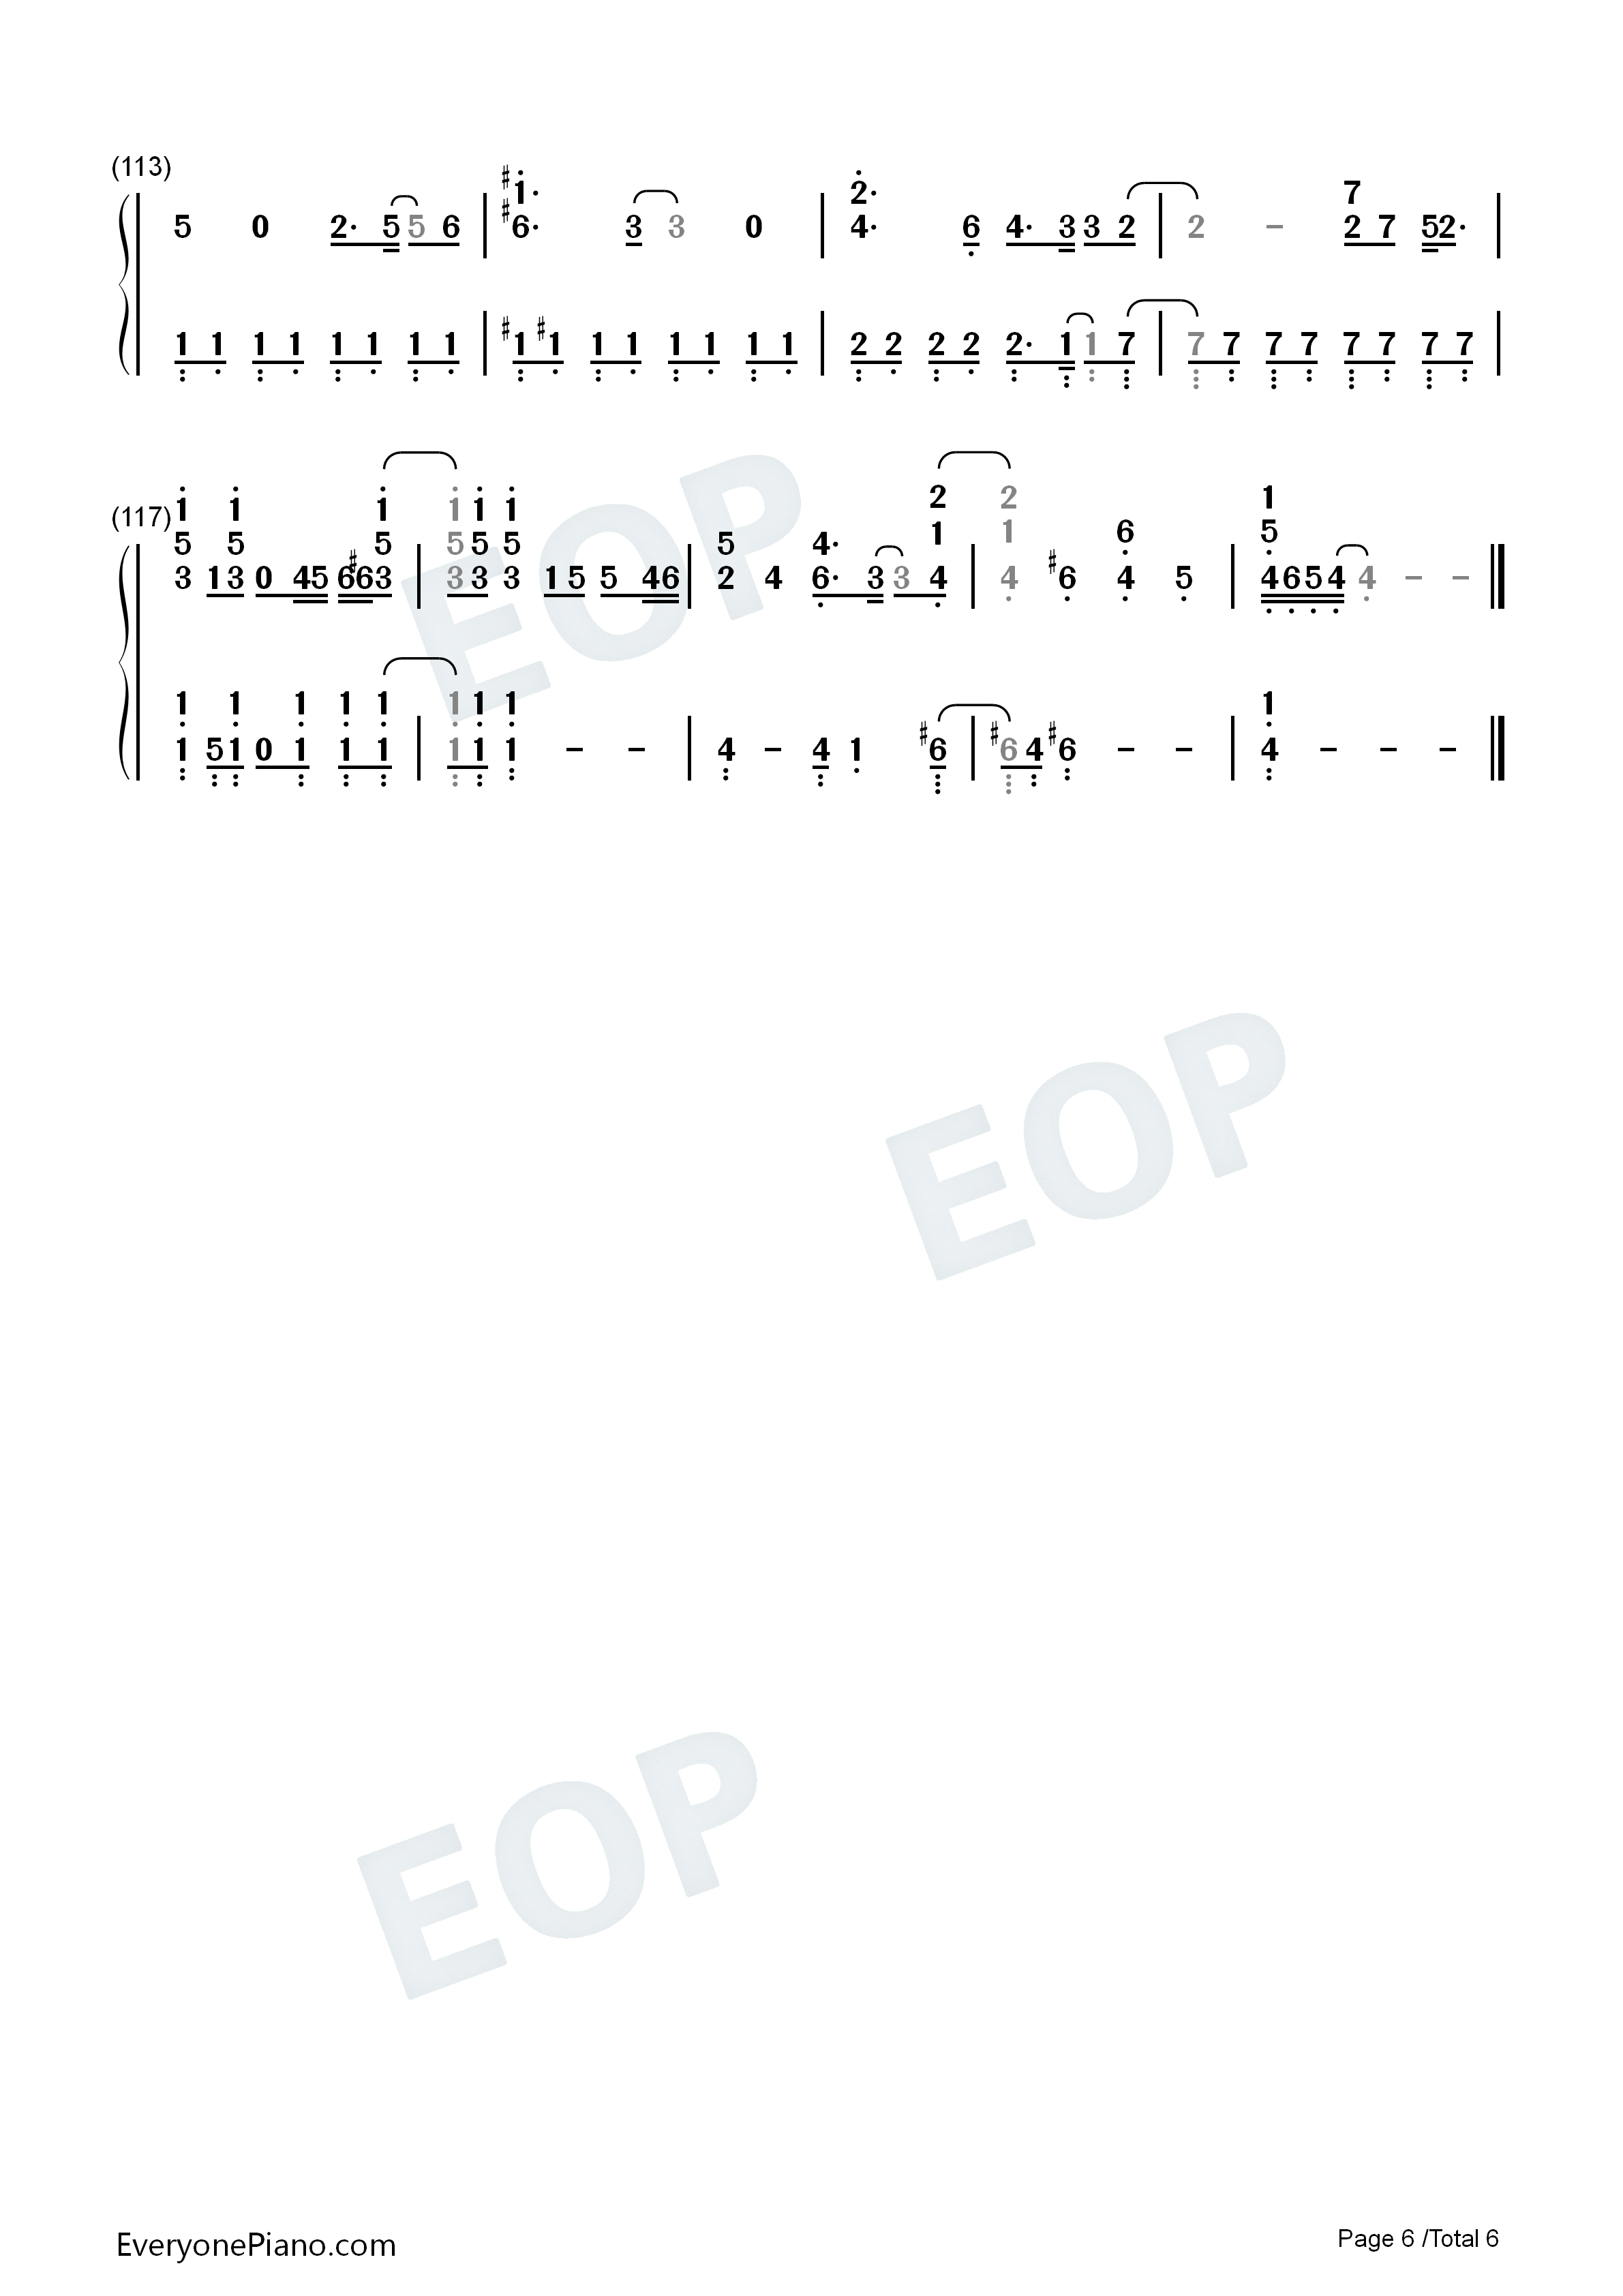 Good Day IU双手简谱预览6 钢琴谱档 五线谱 双手简谱 数位谱 Midi